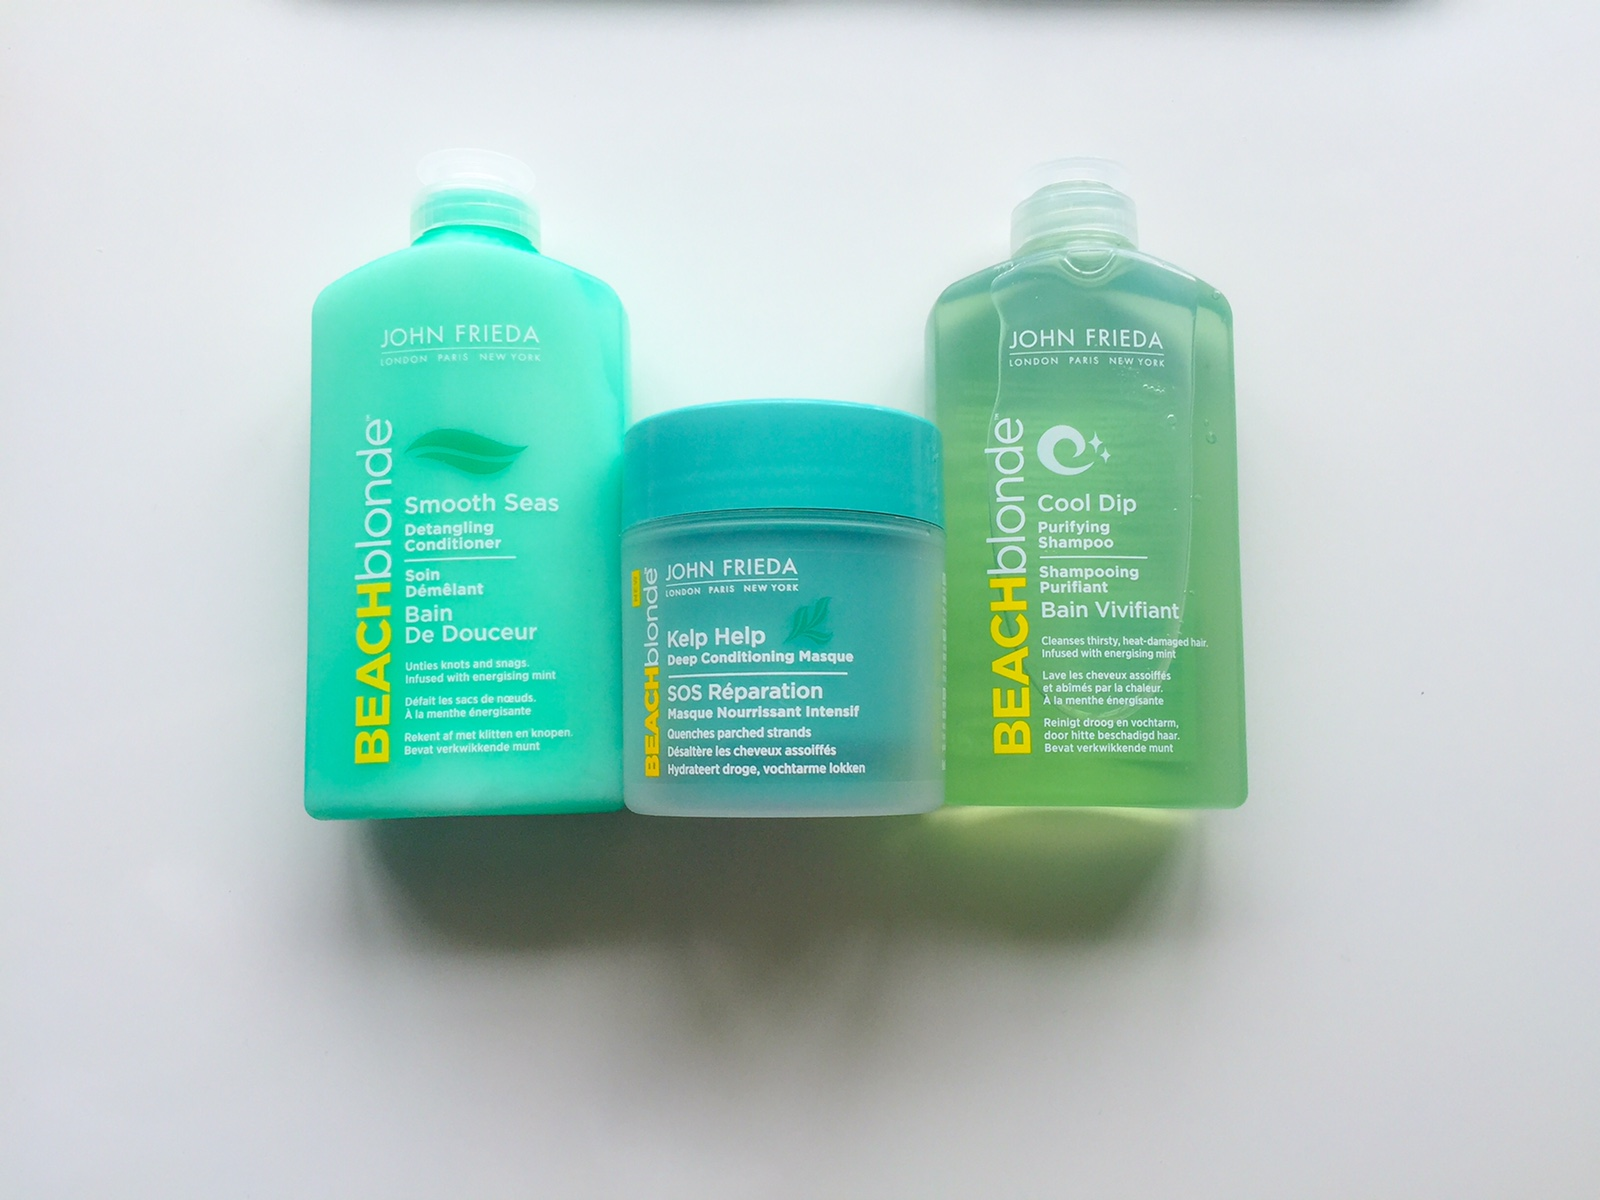 John Frieda Beach Blonde Products